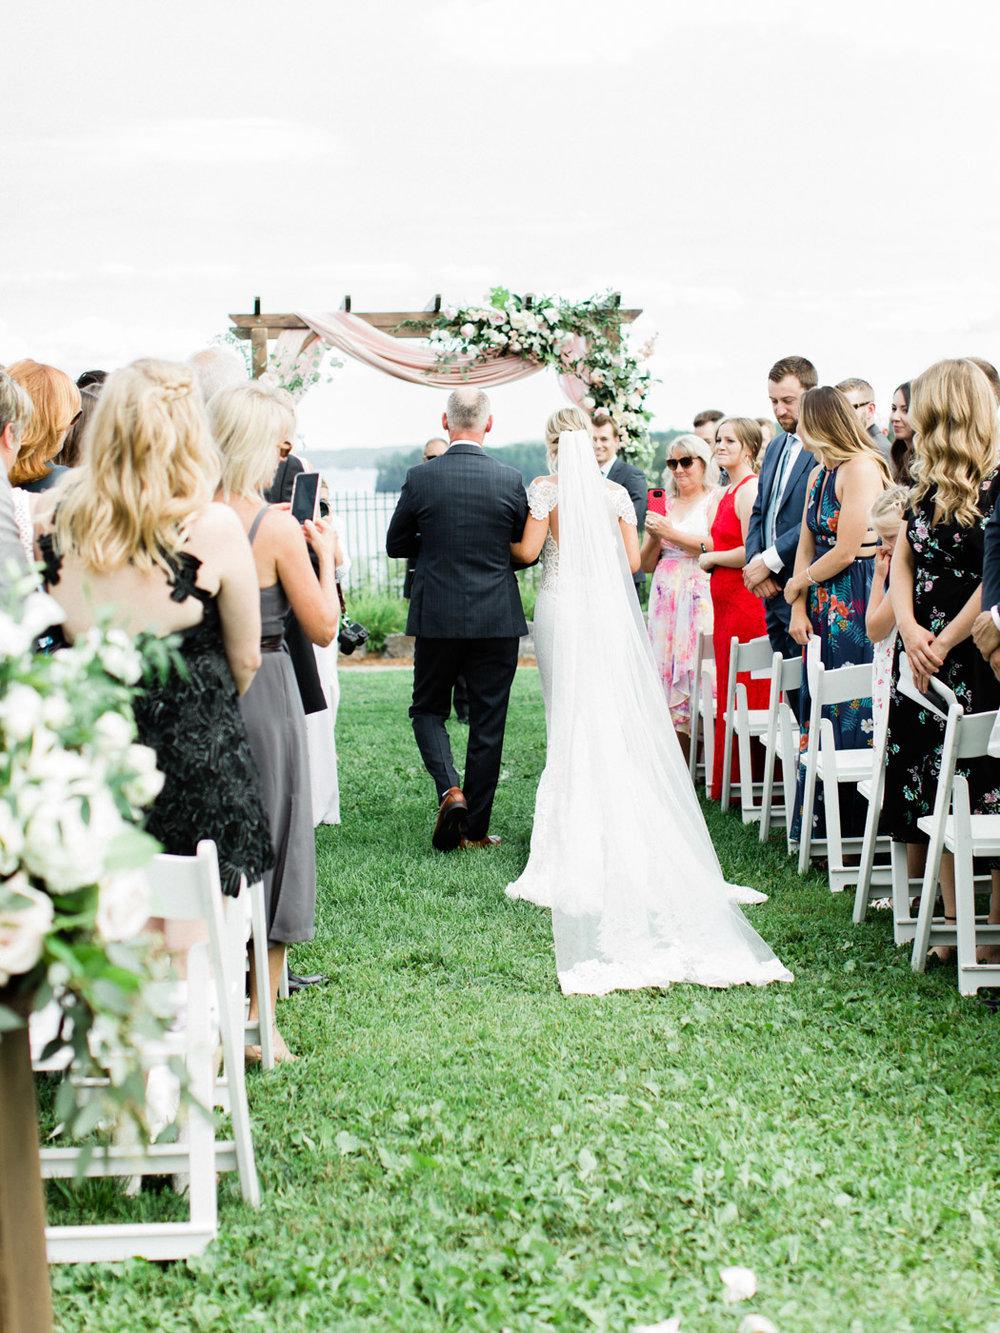 Toronto-Muskoka-wedding-photographer-summery-fun-documentary-the-marriott-rosseau76.jpg